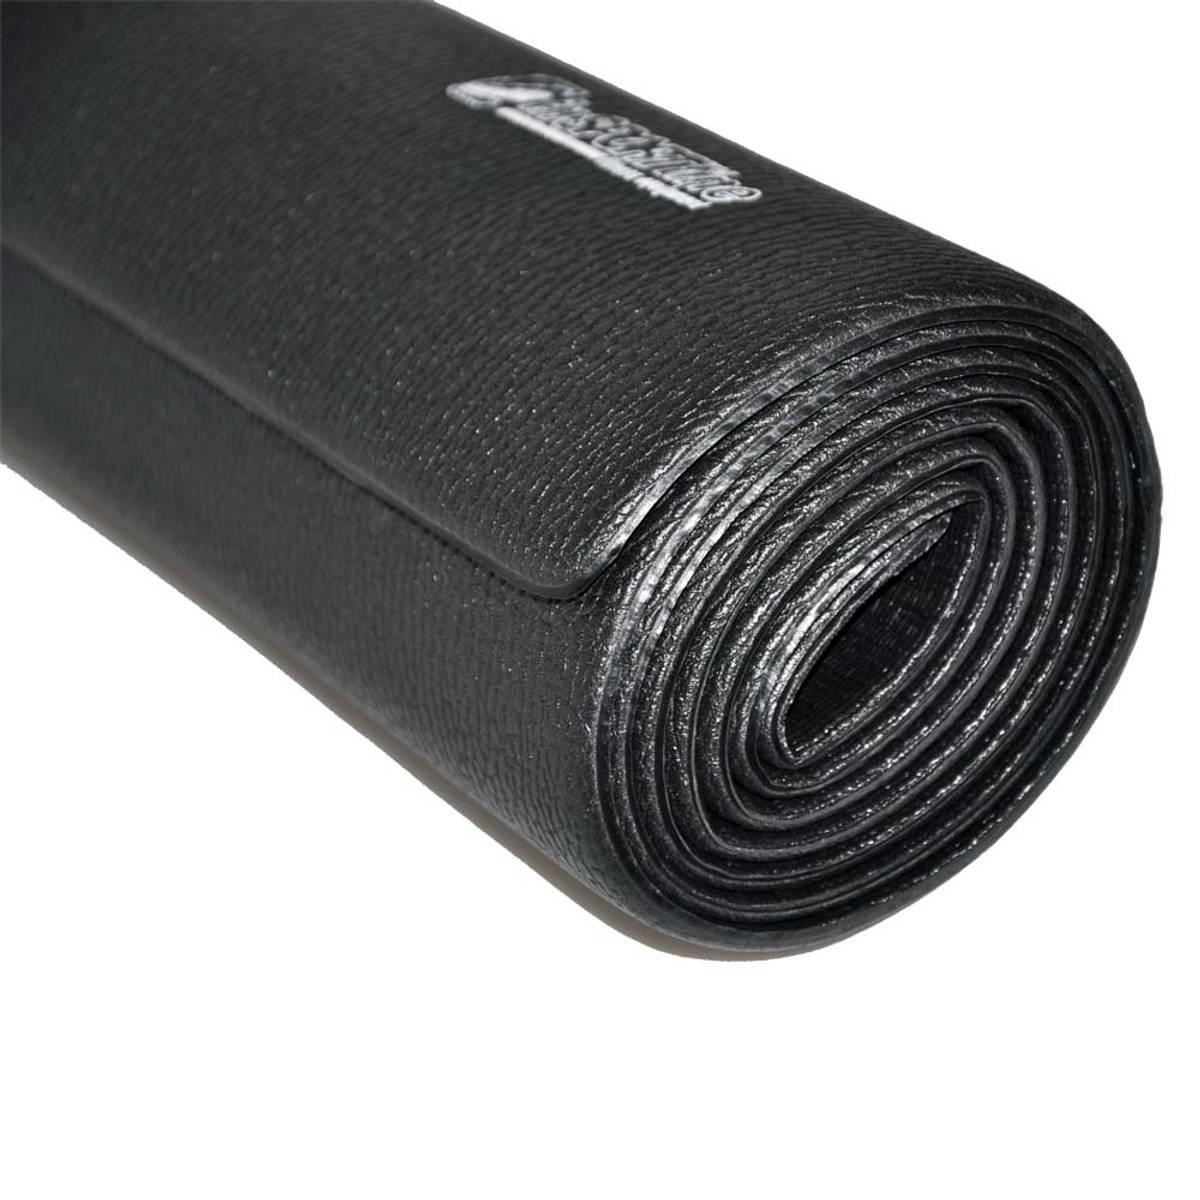 Beskyttelsesmatte inSPORTline 0,6 cm